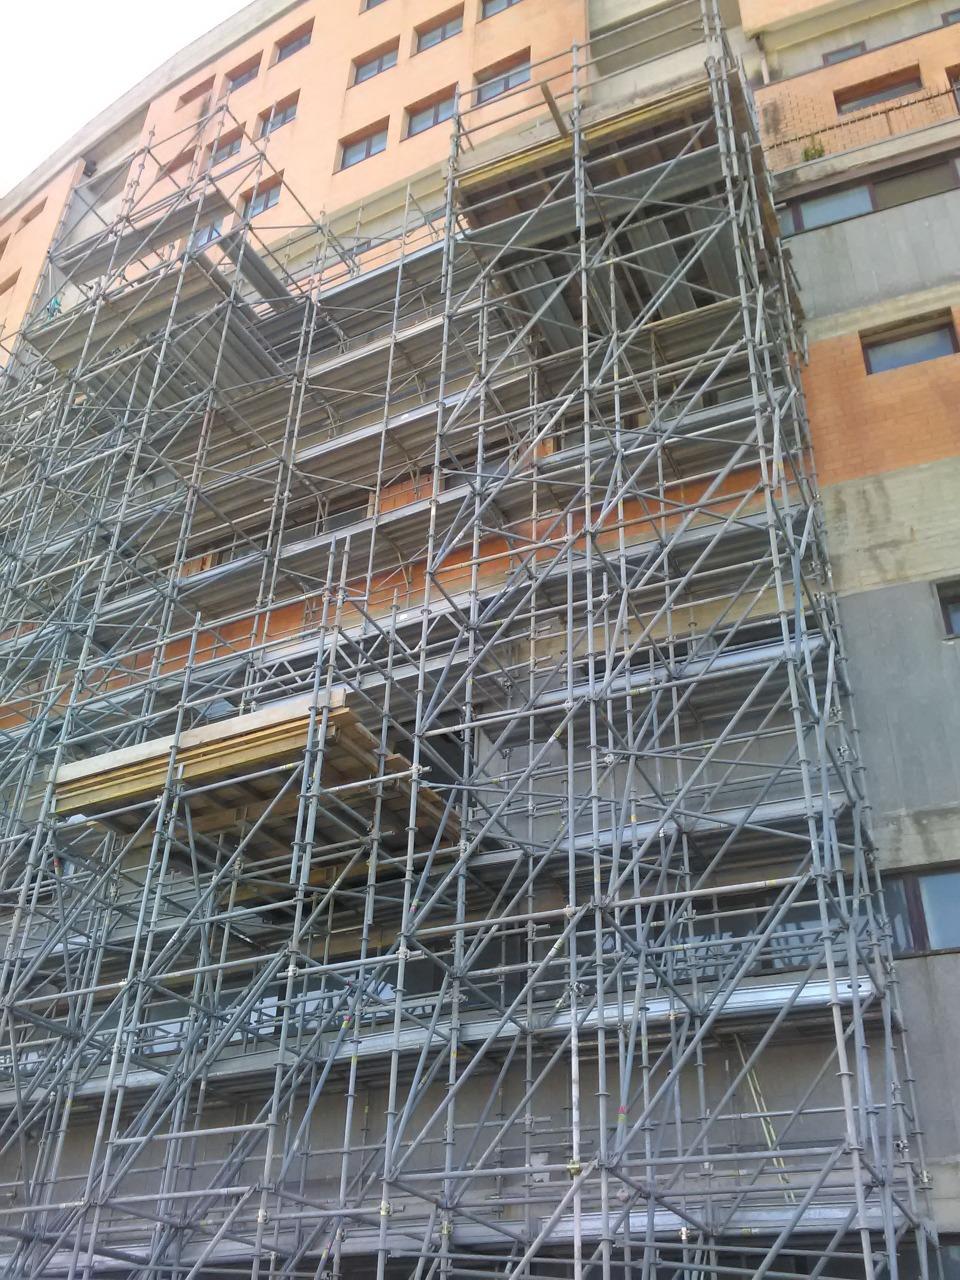 Gallery foto n.1 Torri Multiceta - consolidamento Ospedale